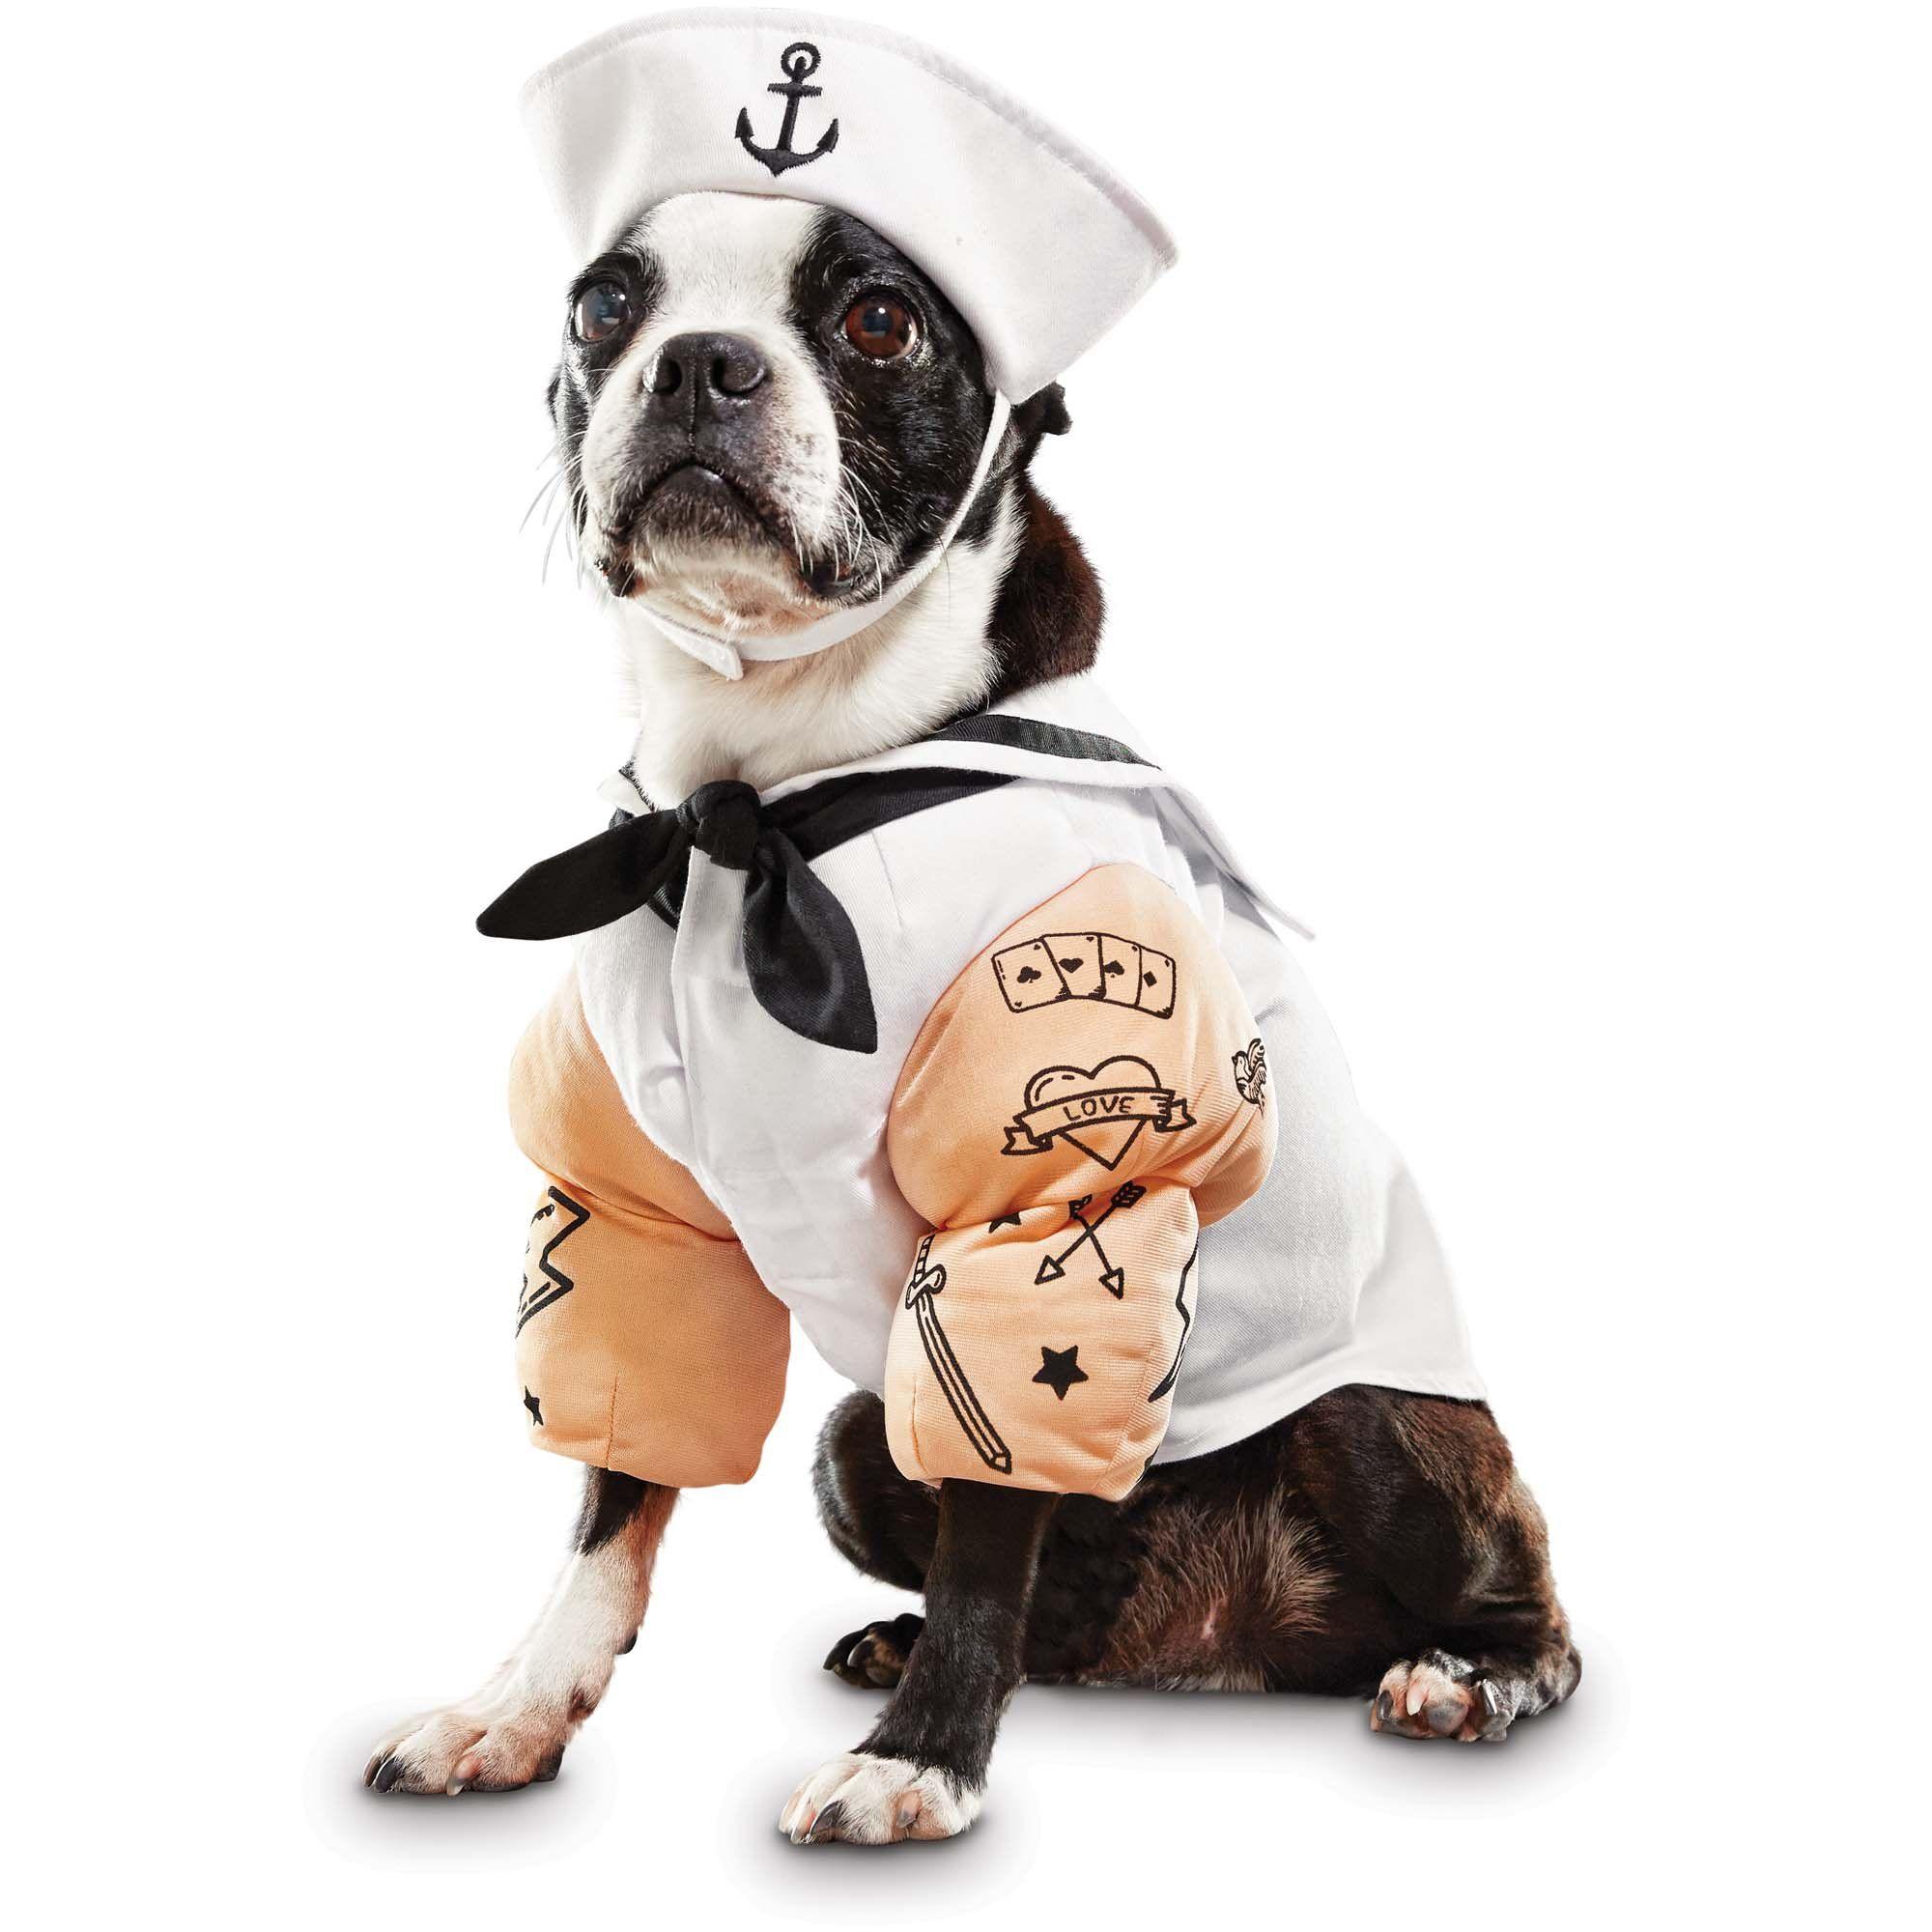 Bootique Sailor Dog Costume Https Www Petco Com Shop En